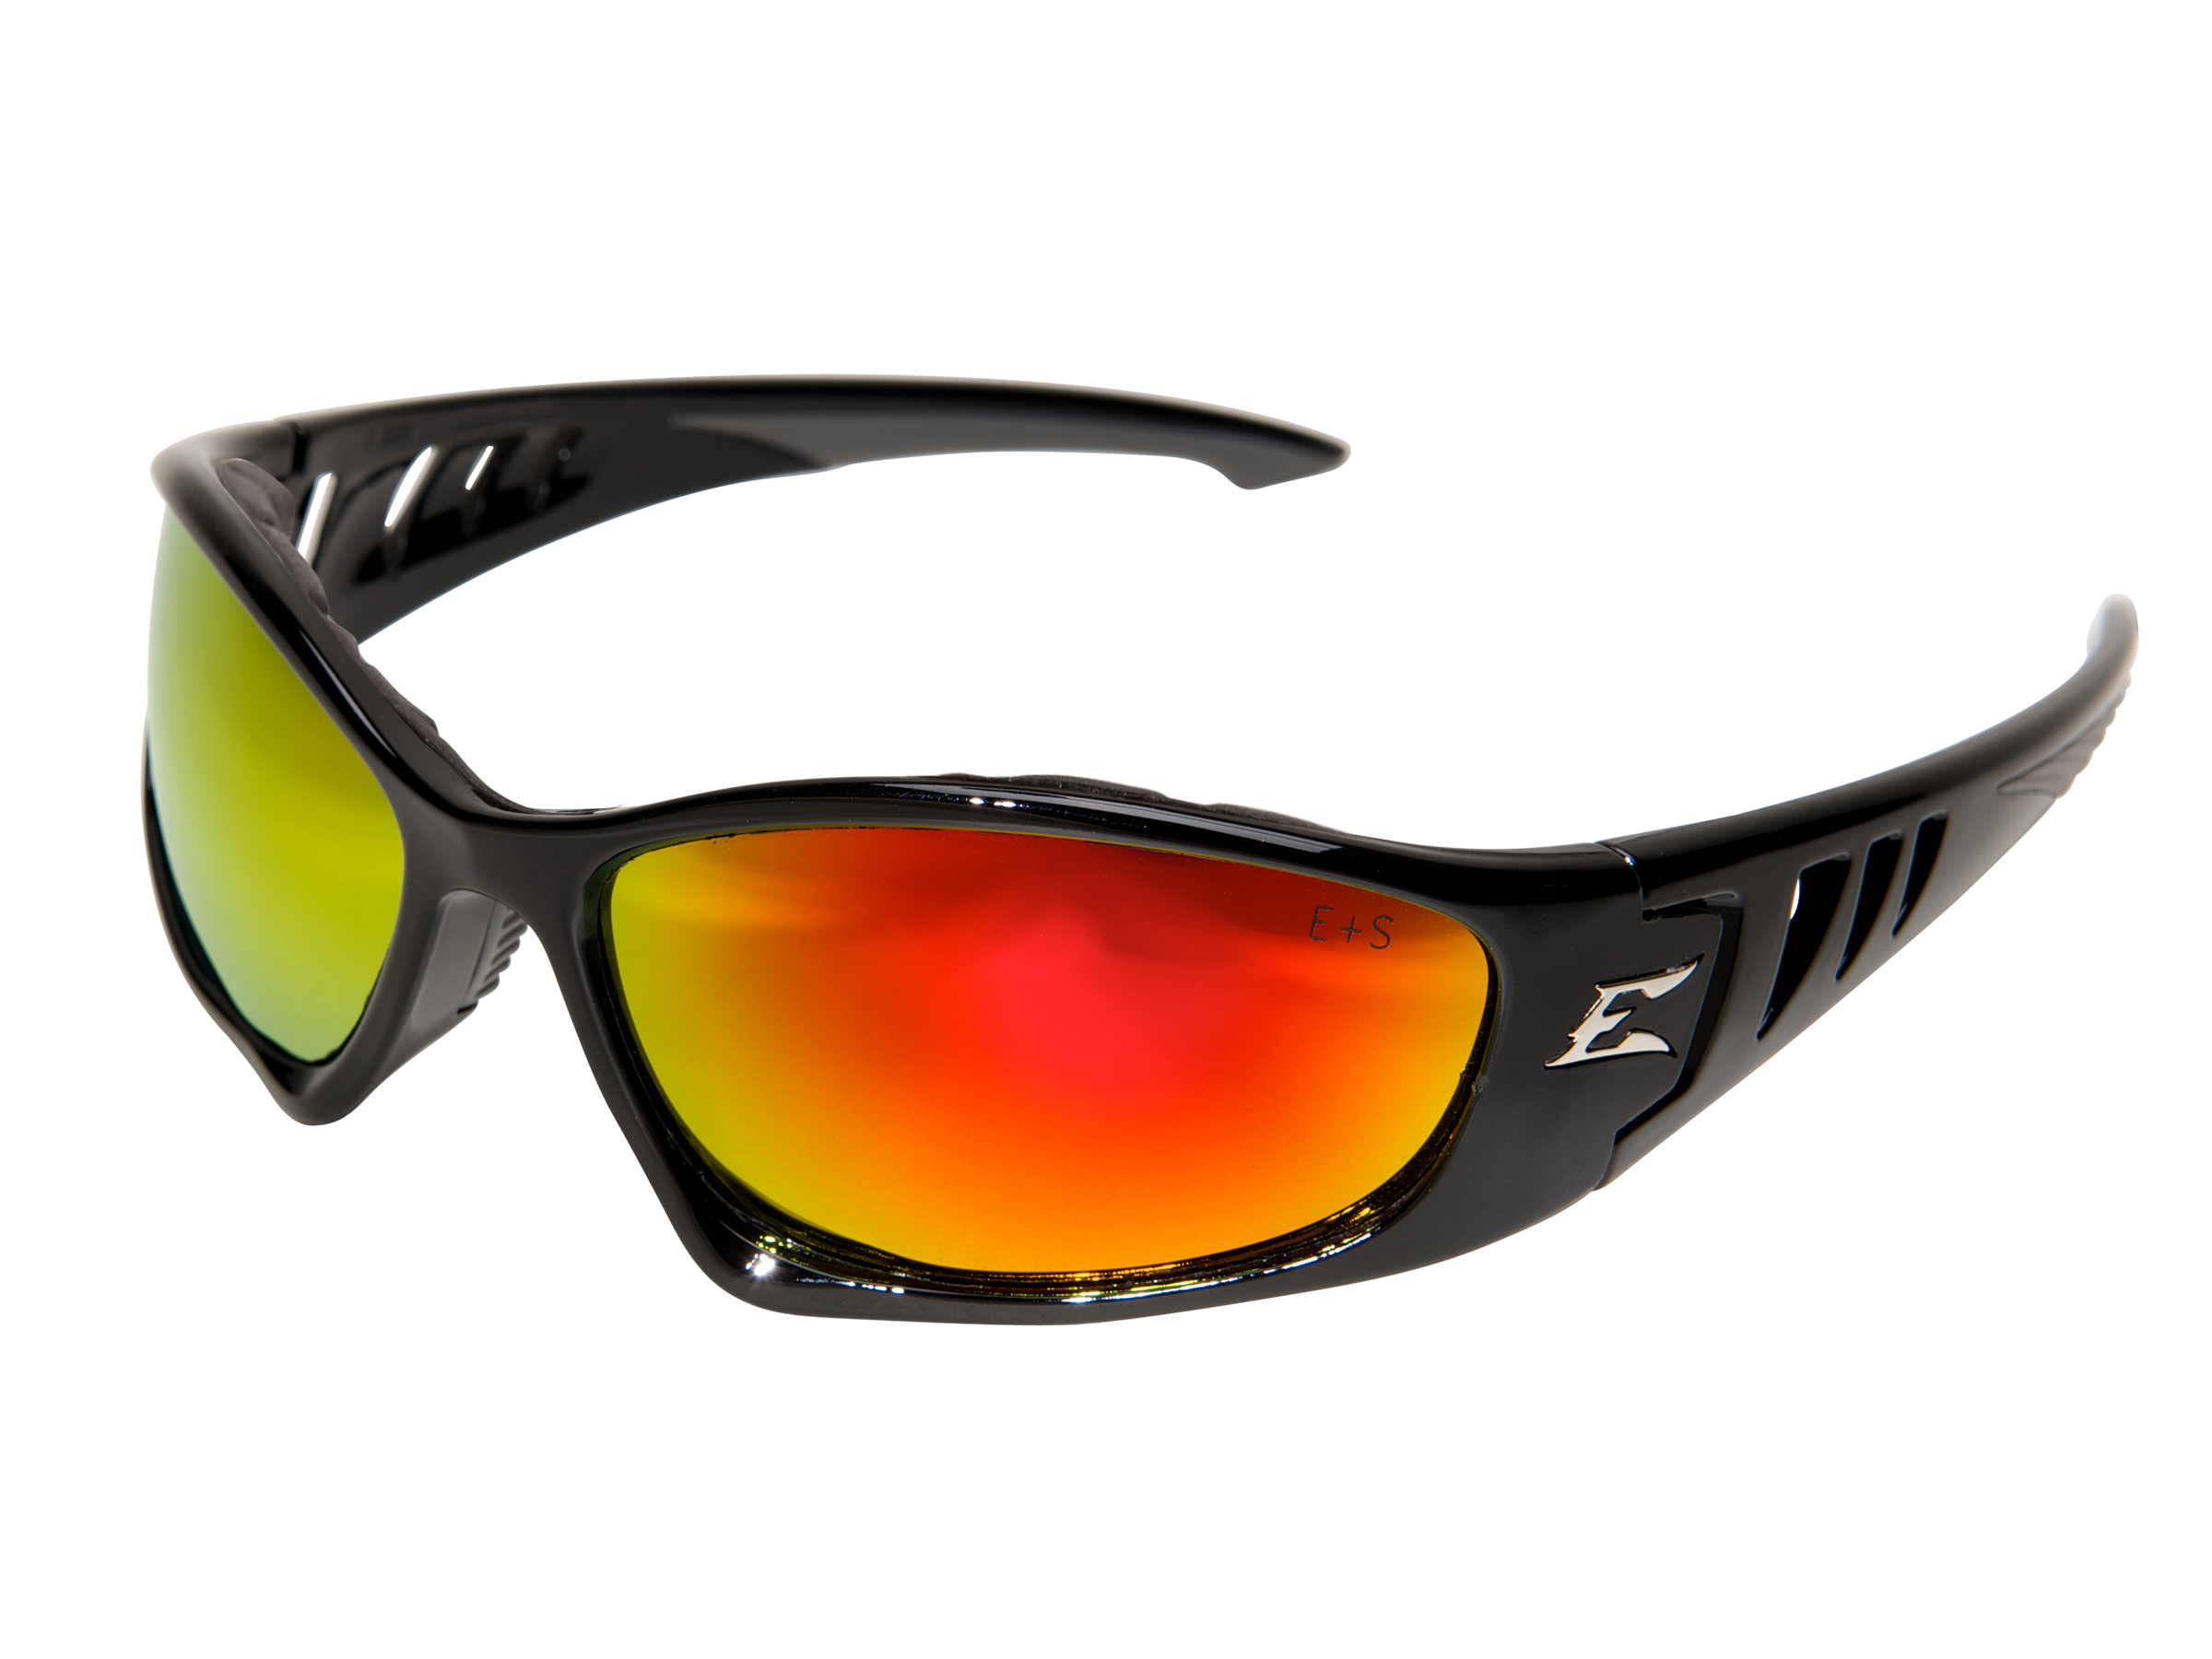 Edge® Safety Eyewear Baretti Sunglass Aqua Precision Red Mirror Lens GSBAP119